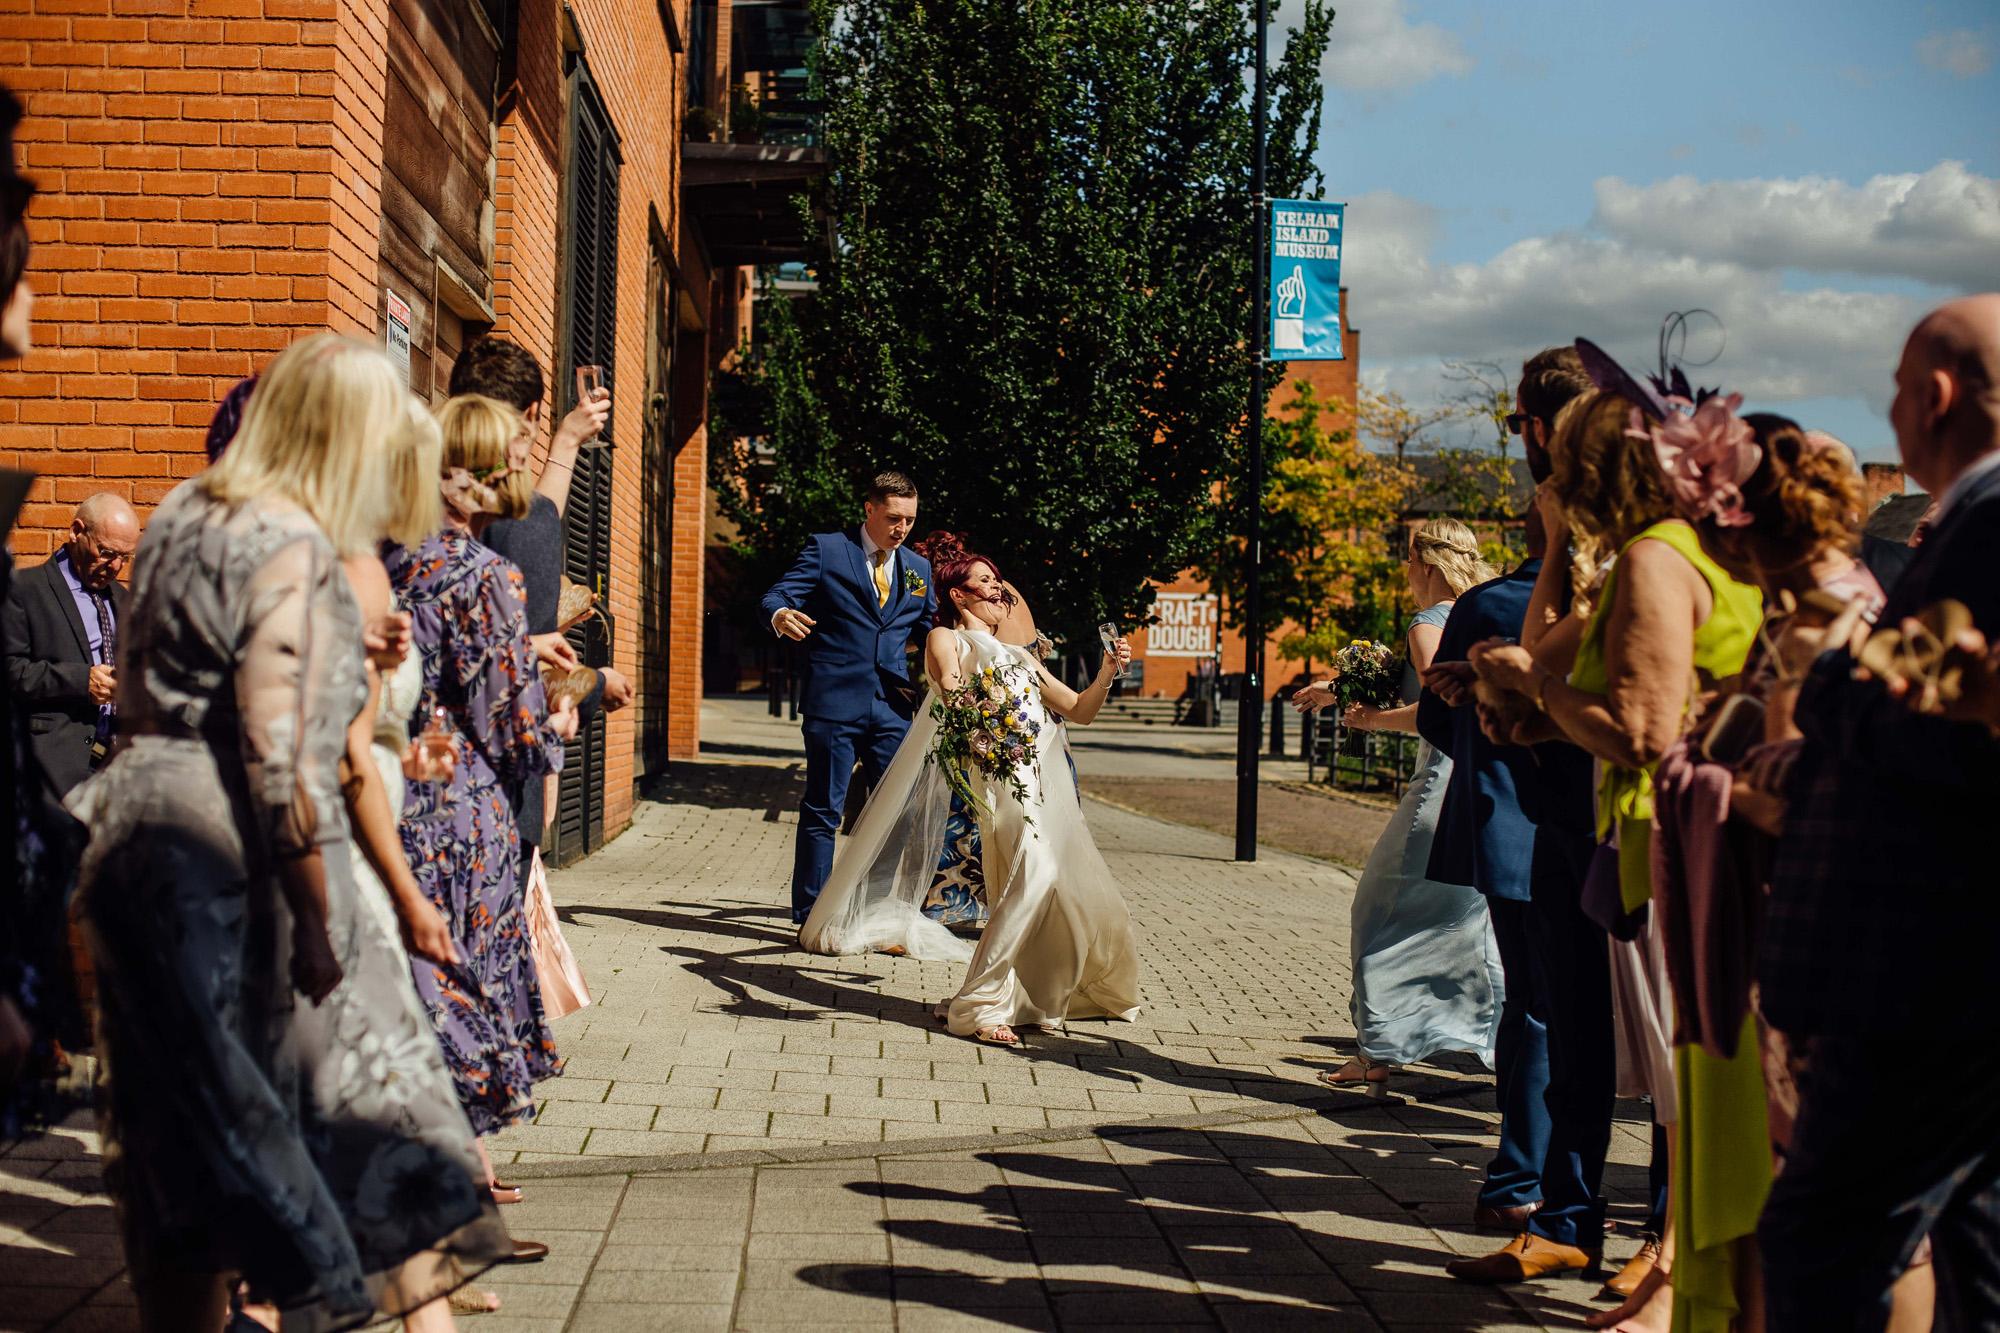 Sarah-Honeysuckle-Bias-Cut-Silk-Vintage-Inspired-Wedding-Gown-Sheffield-Wedding-Kate-Beaumont-41.jpg